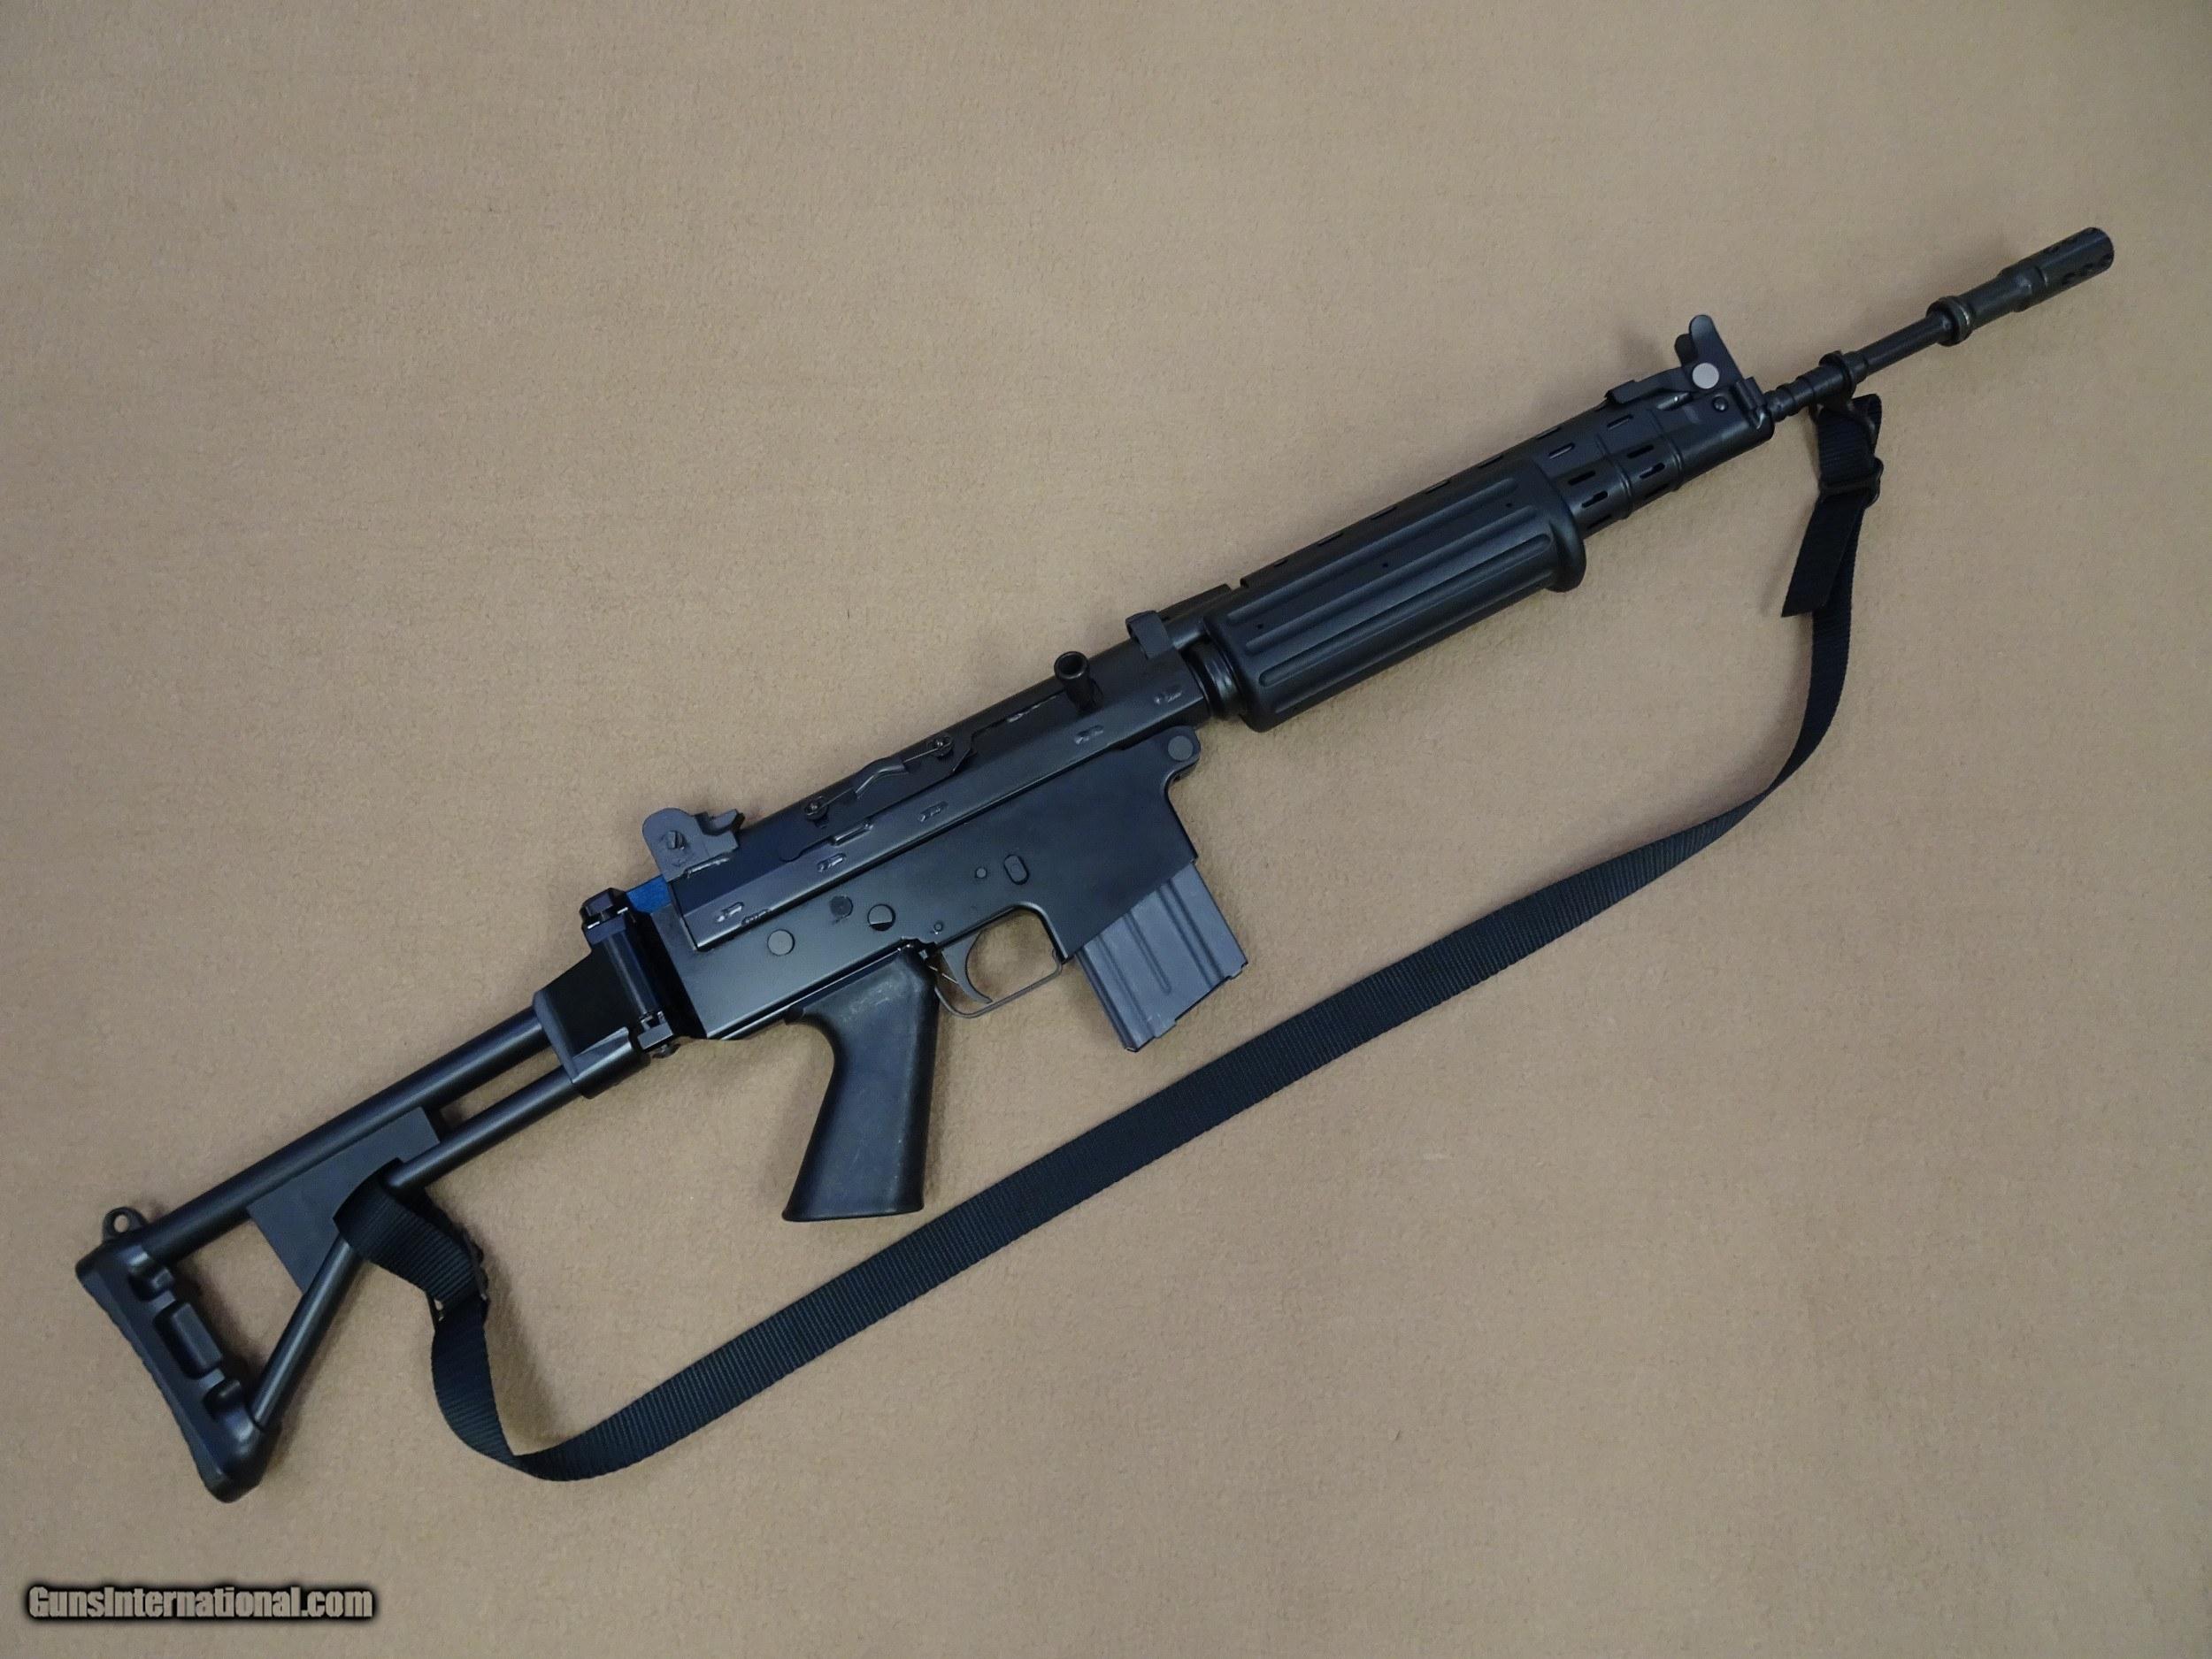 Rare Pre-Ban FN Model FNC Sporter Paratrooper Model in  223